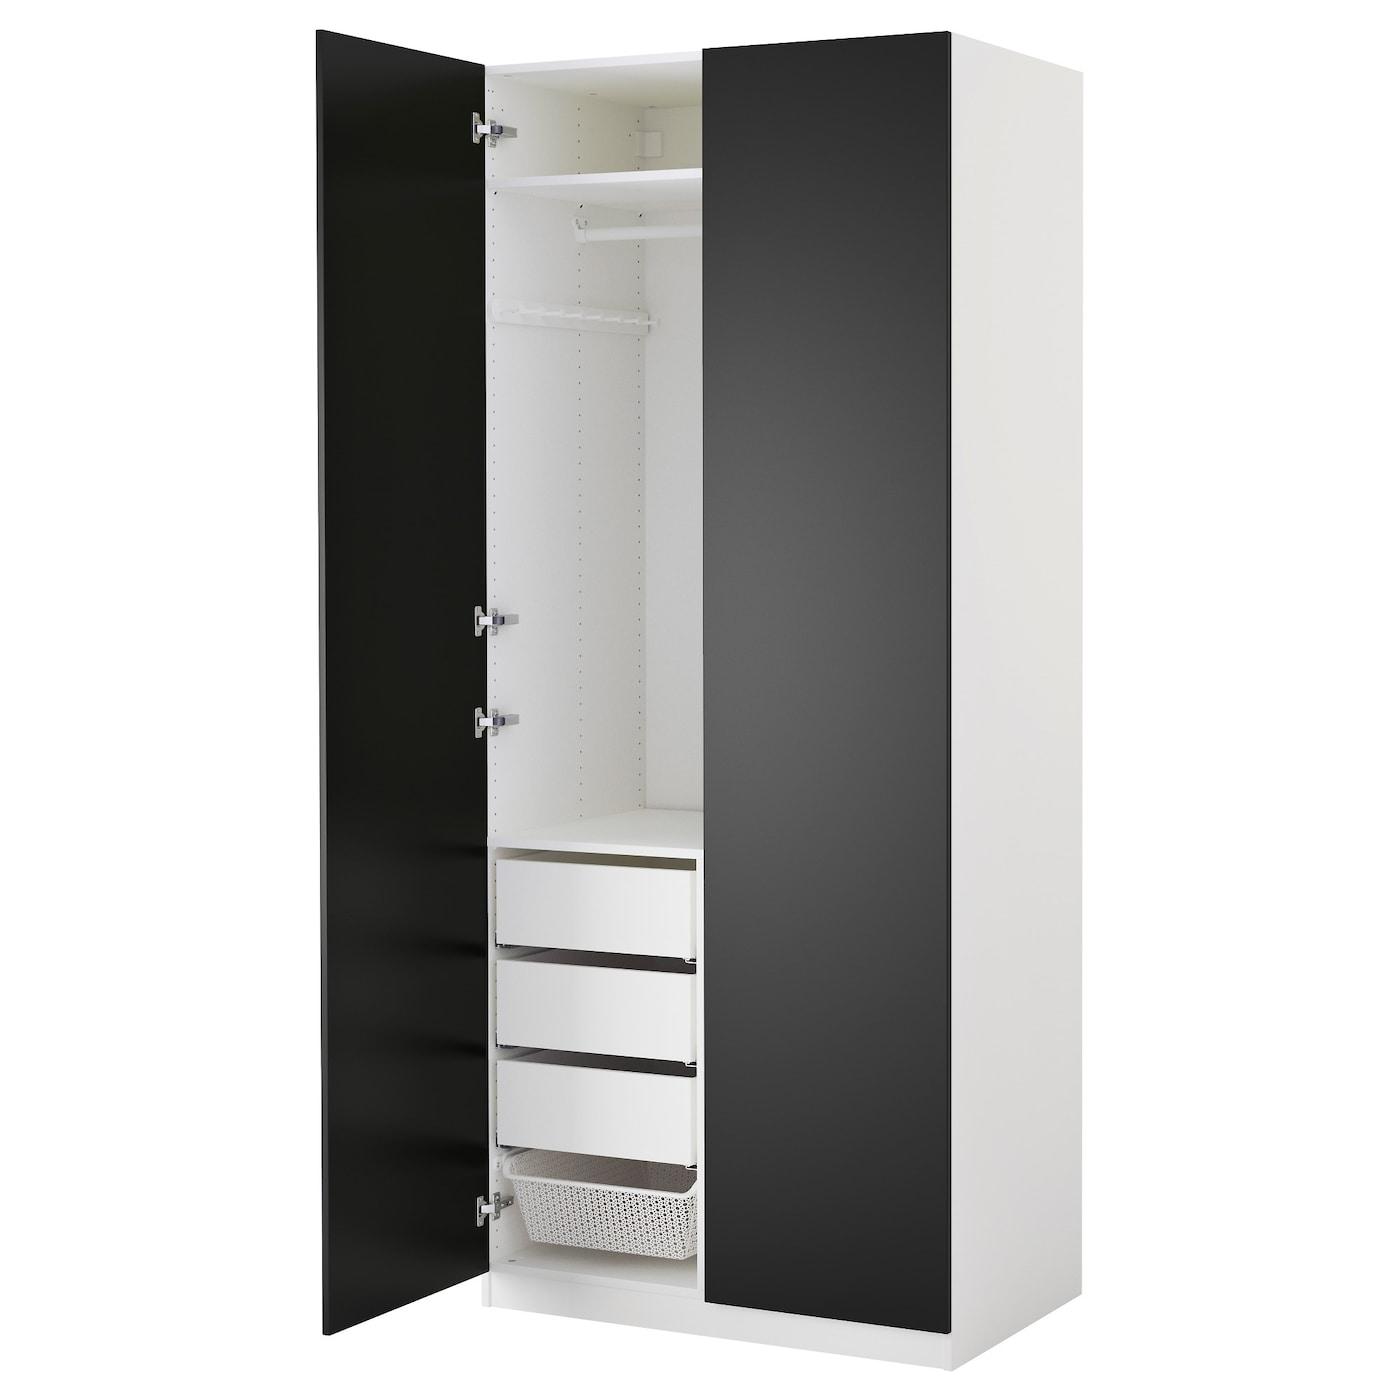 PAX Wardrobe White tanem black 100x60x236 cm IKEA